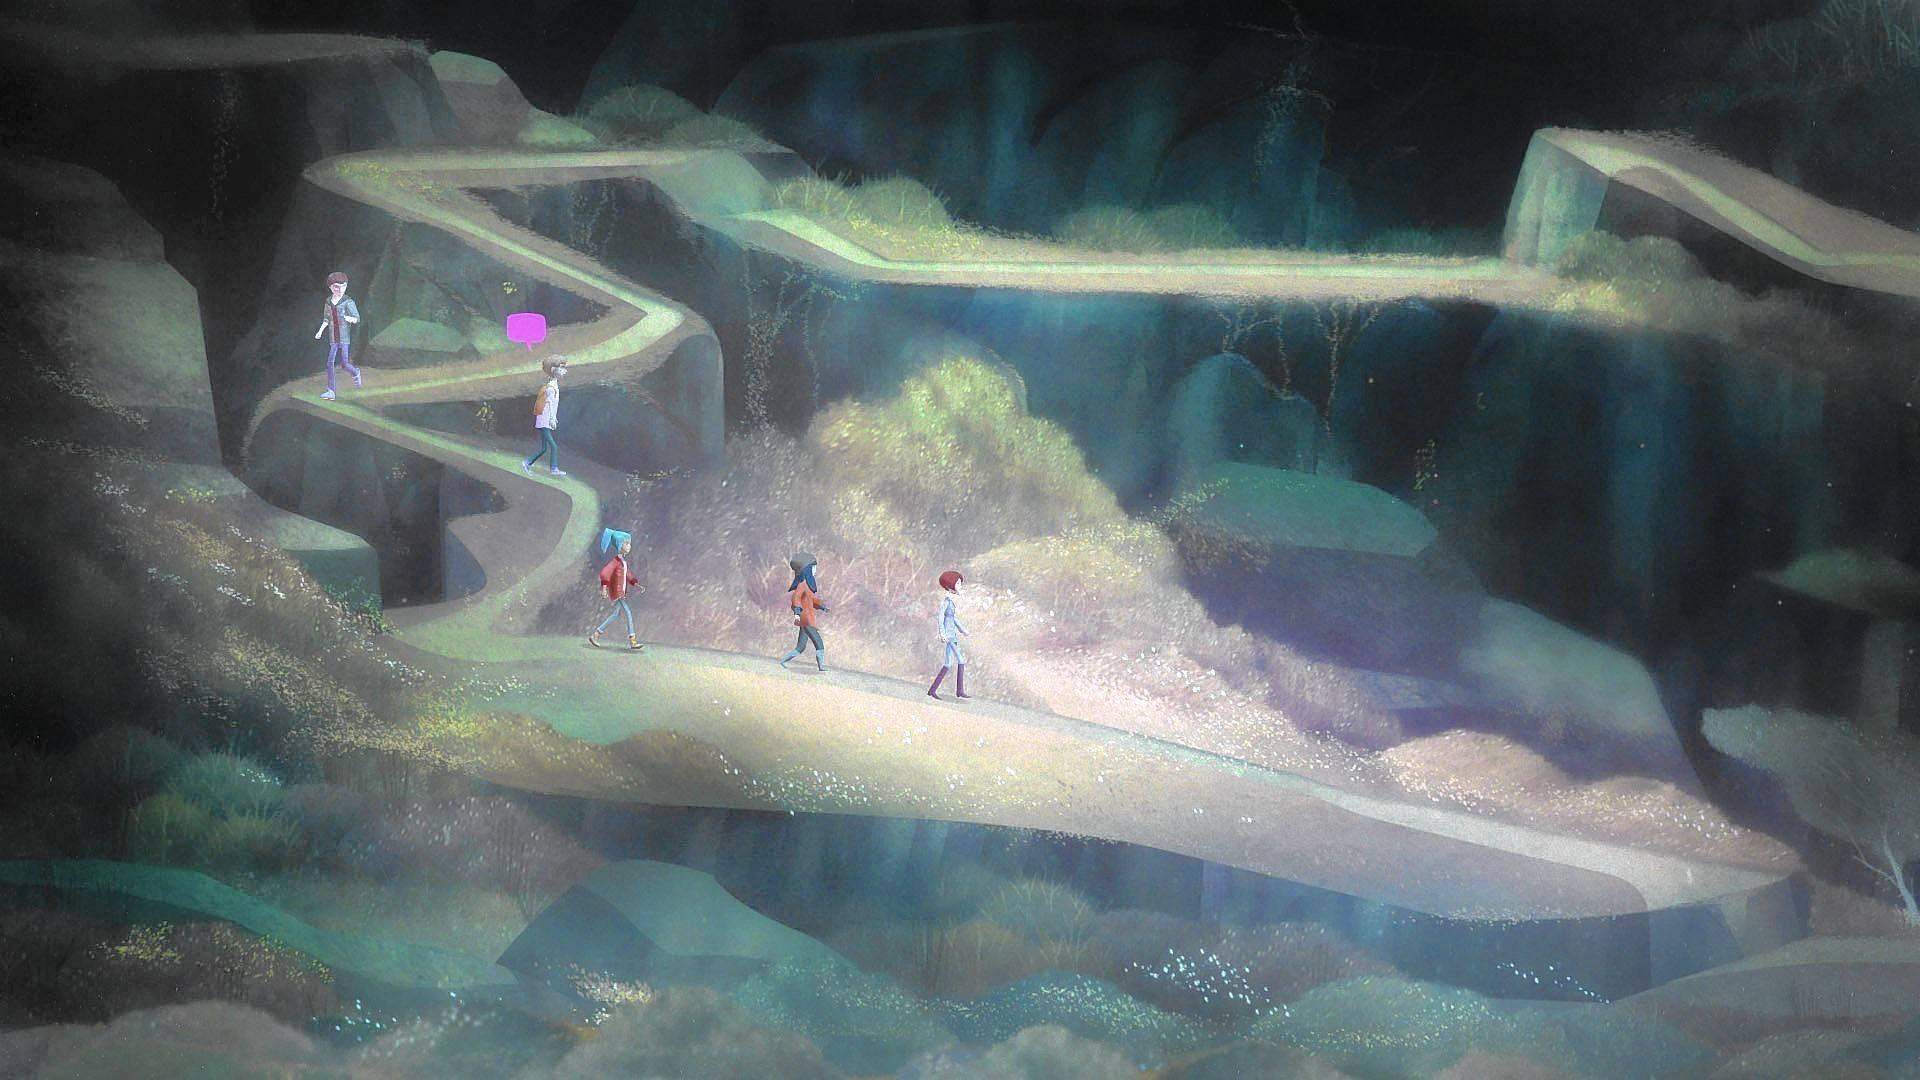 Wallpaper Supernatural 3d Review Oxenfree Pc That Videogame Blog